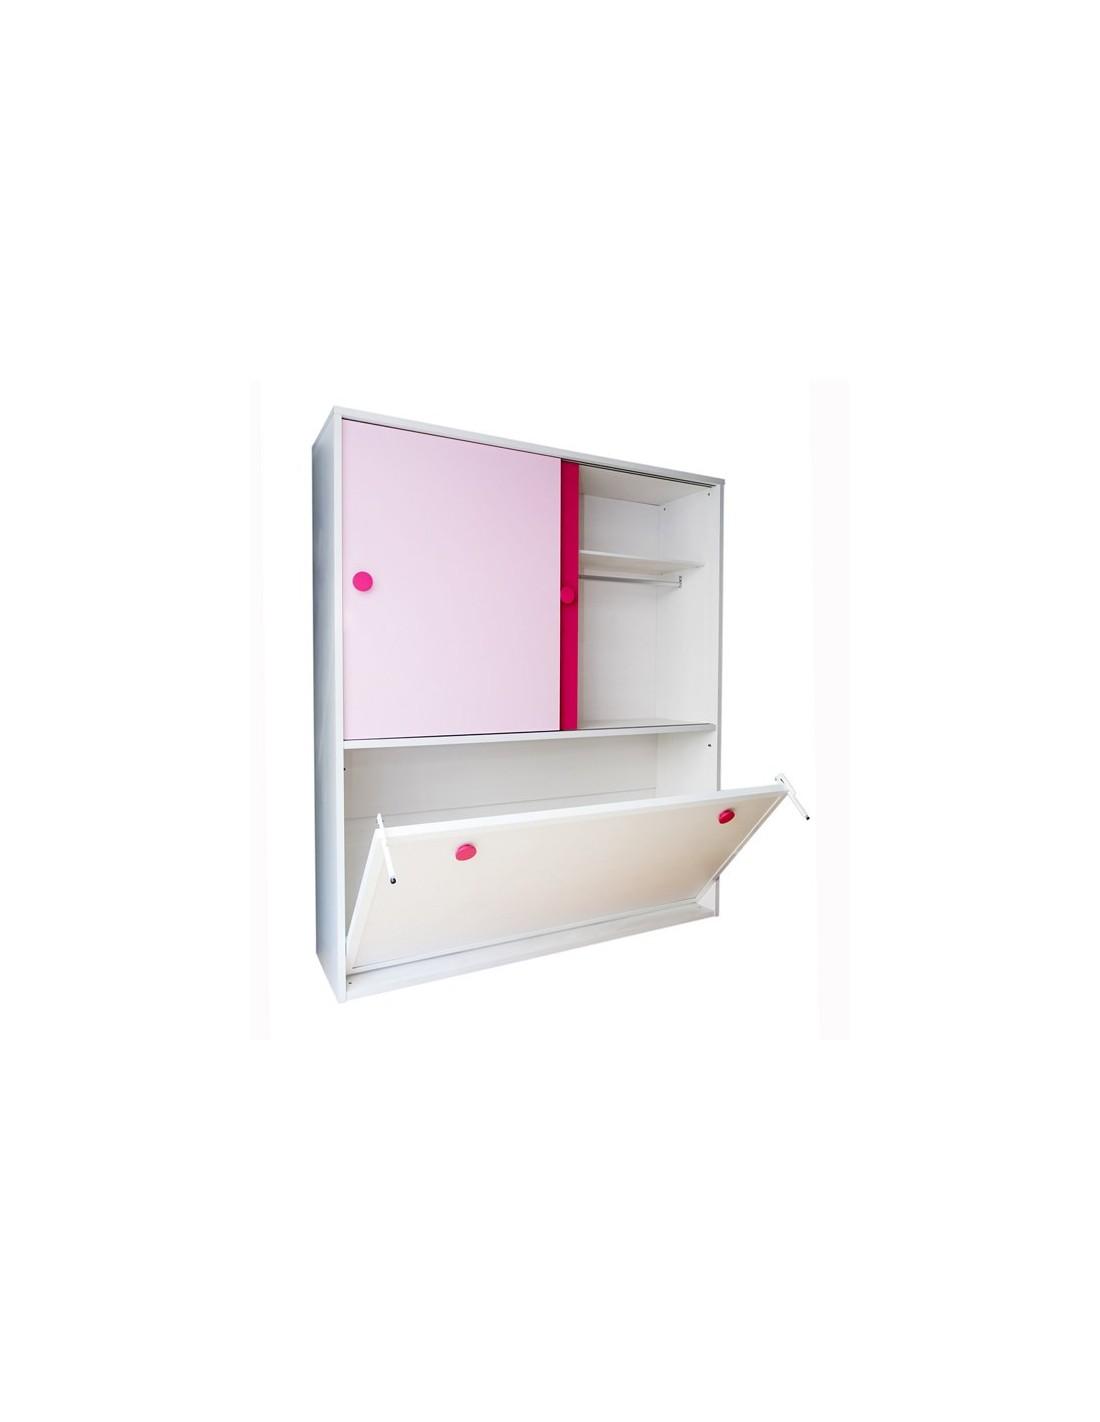 Artesanato Luminaria Madeira ~ Cama abatible horizontal con armario en oferta Muebles Noel